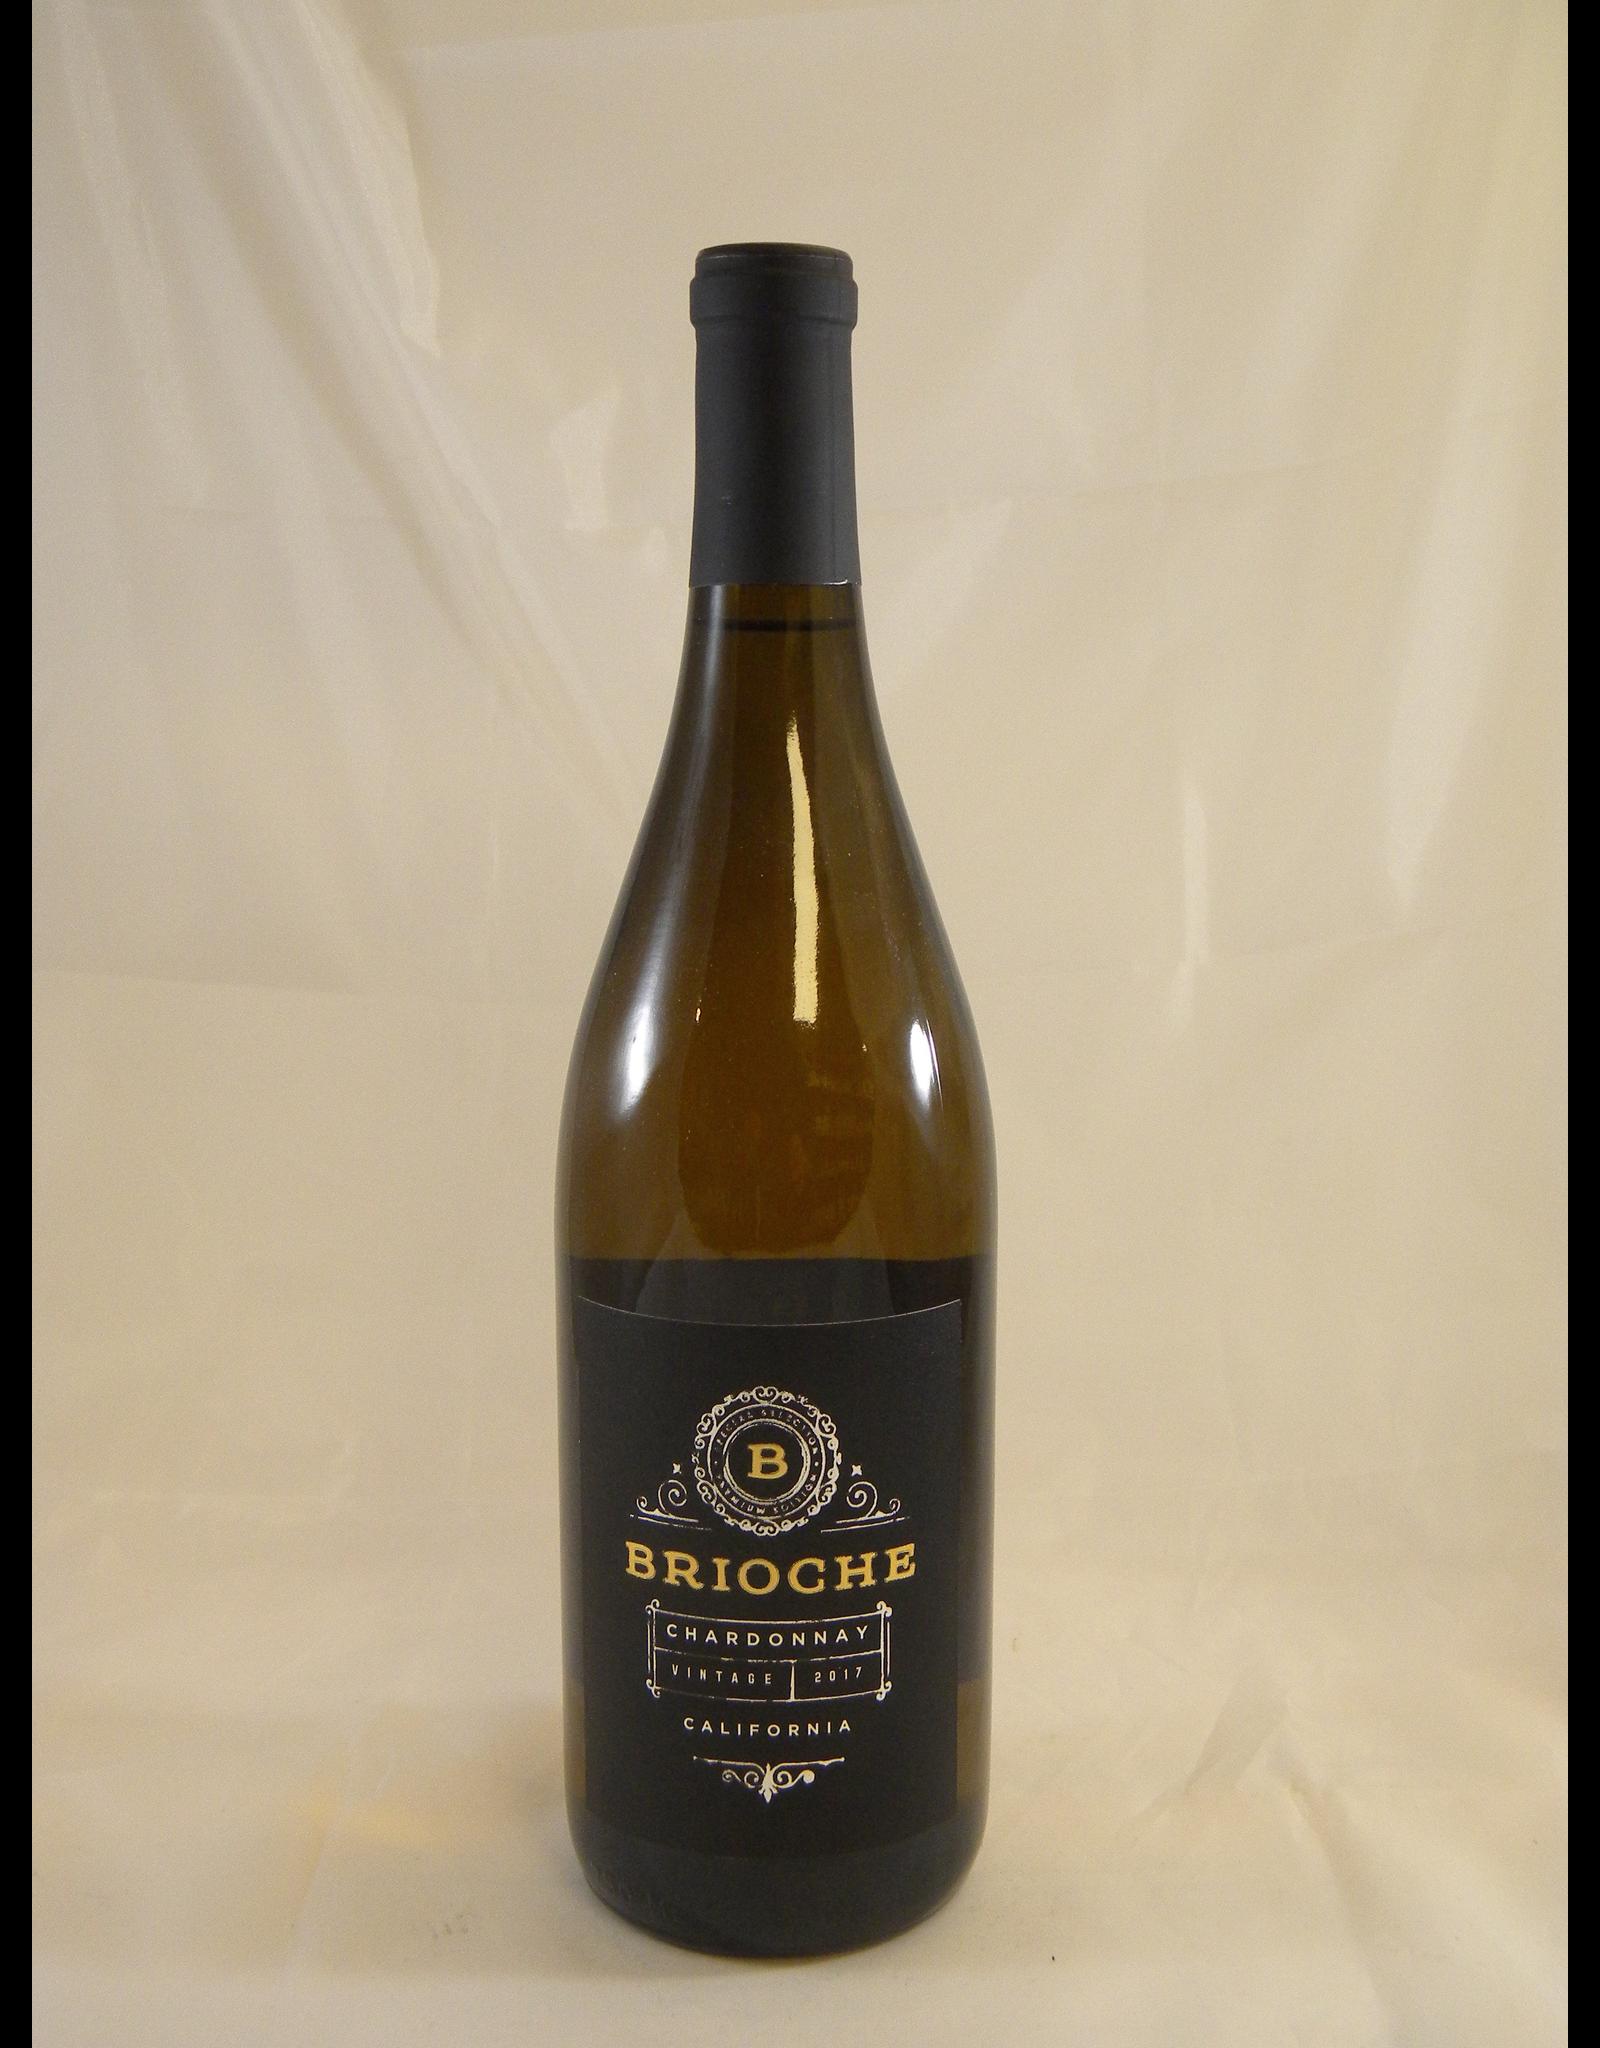 Brioche Chardonnay California 2017